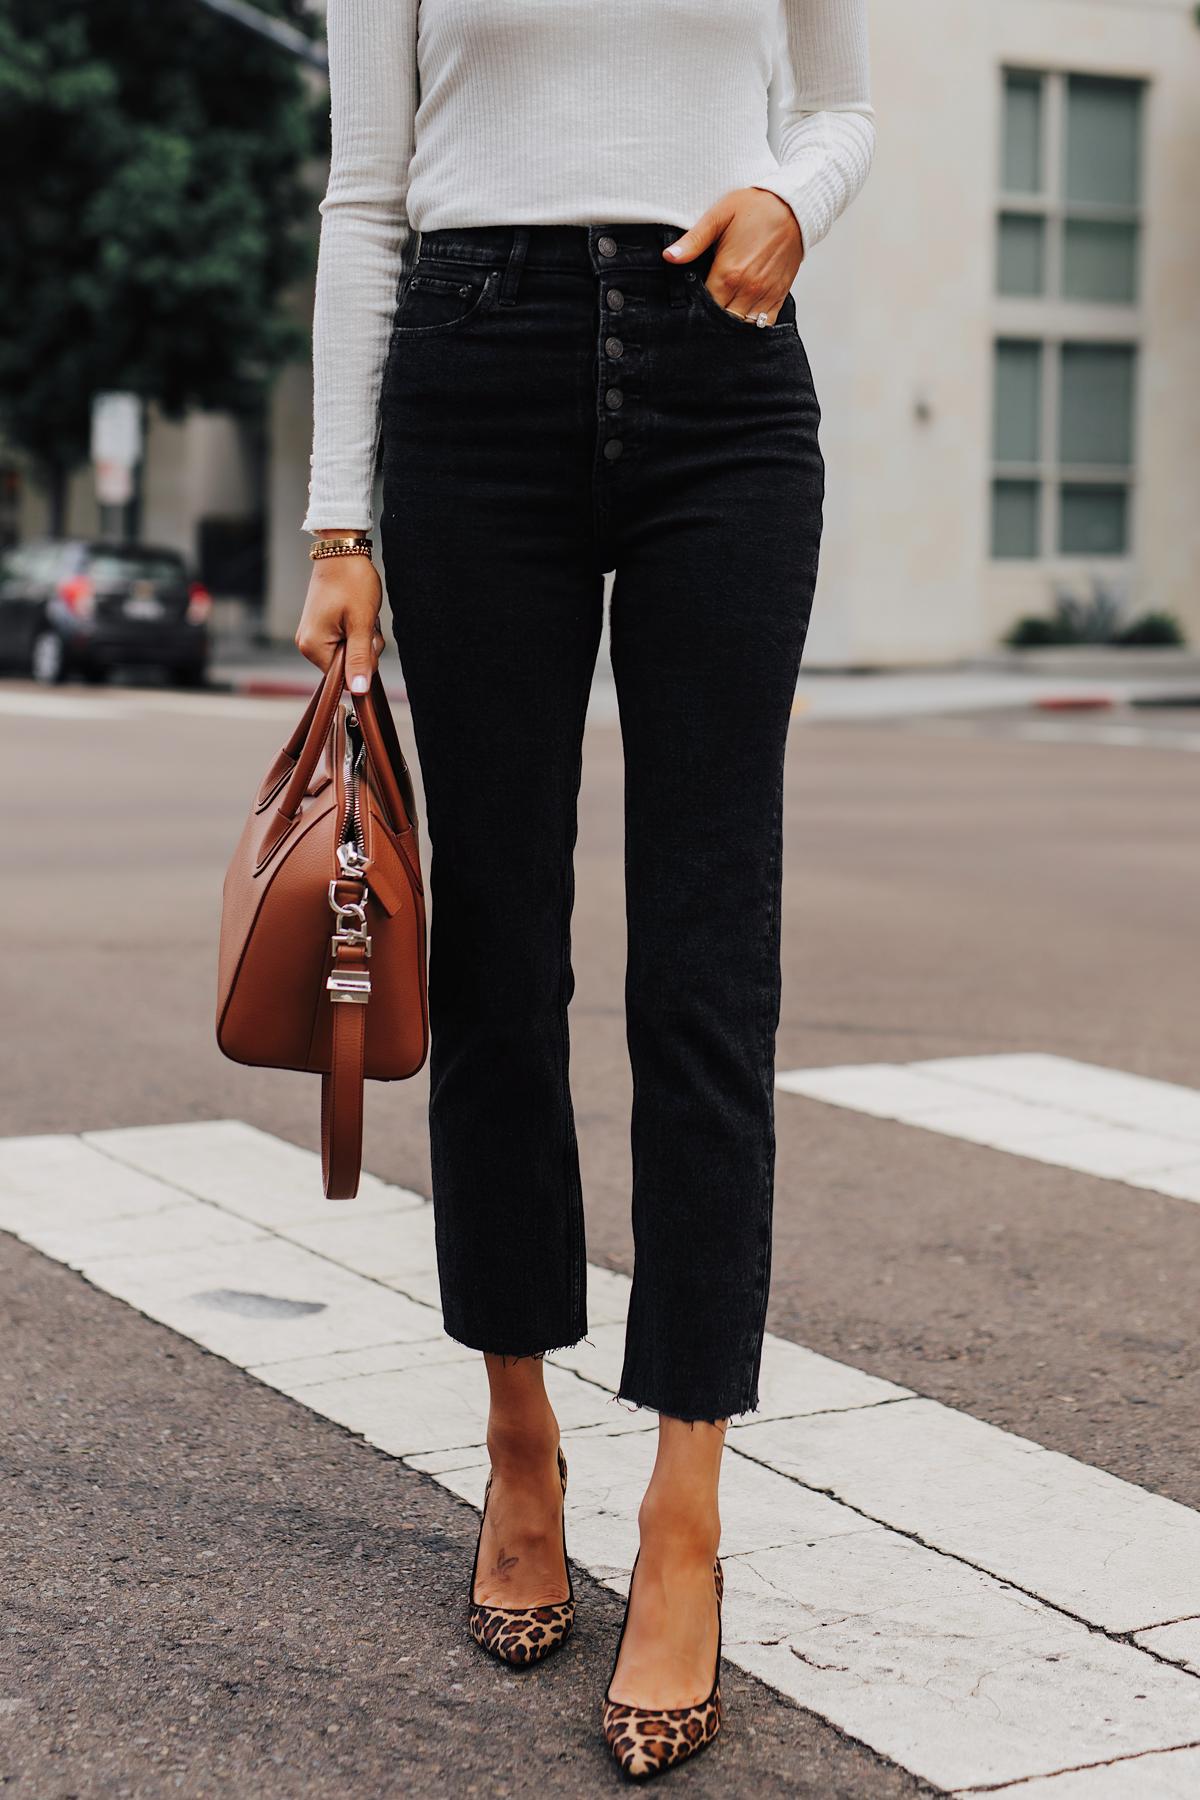 Fashion Jackson Wearing White Top Abercrombie Button Front Raw Hem Mom Jeans Leopard Pumps